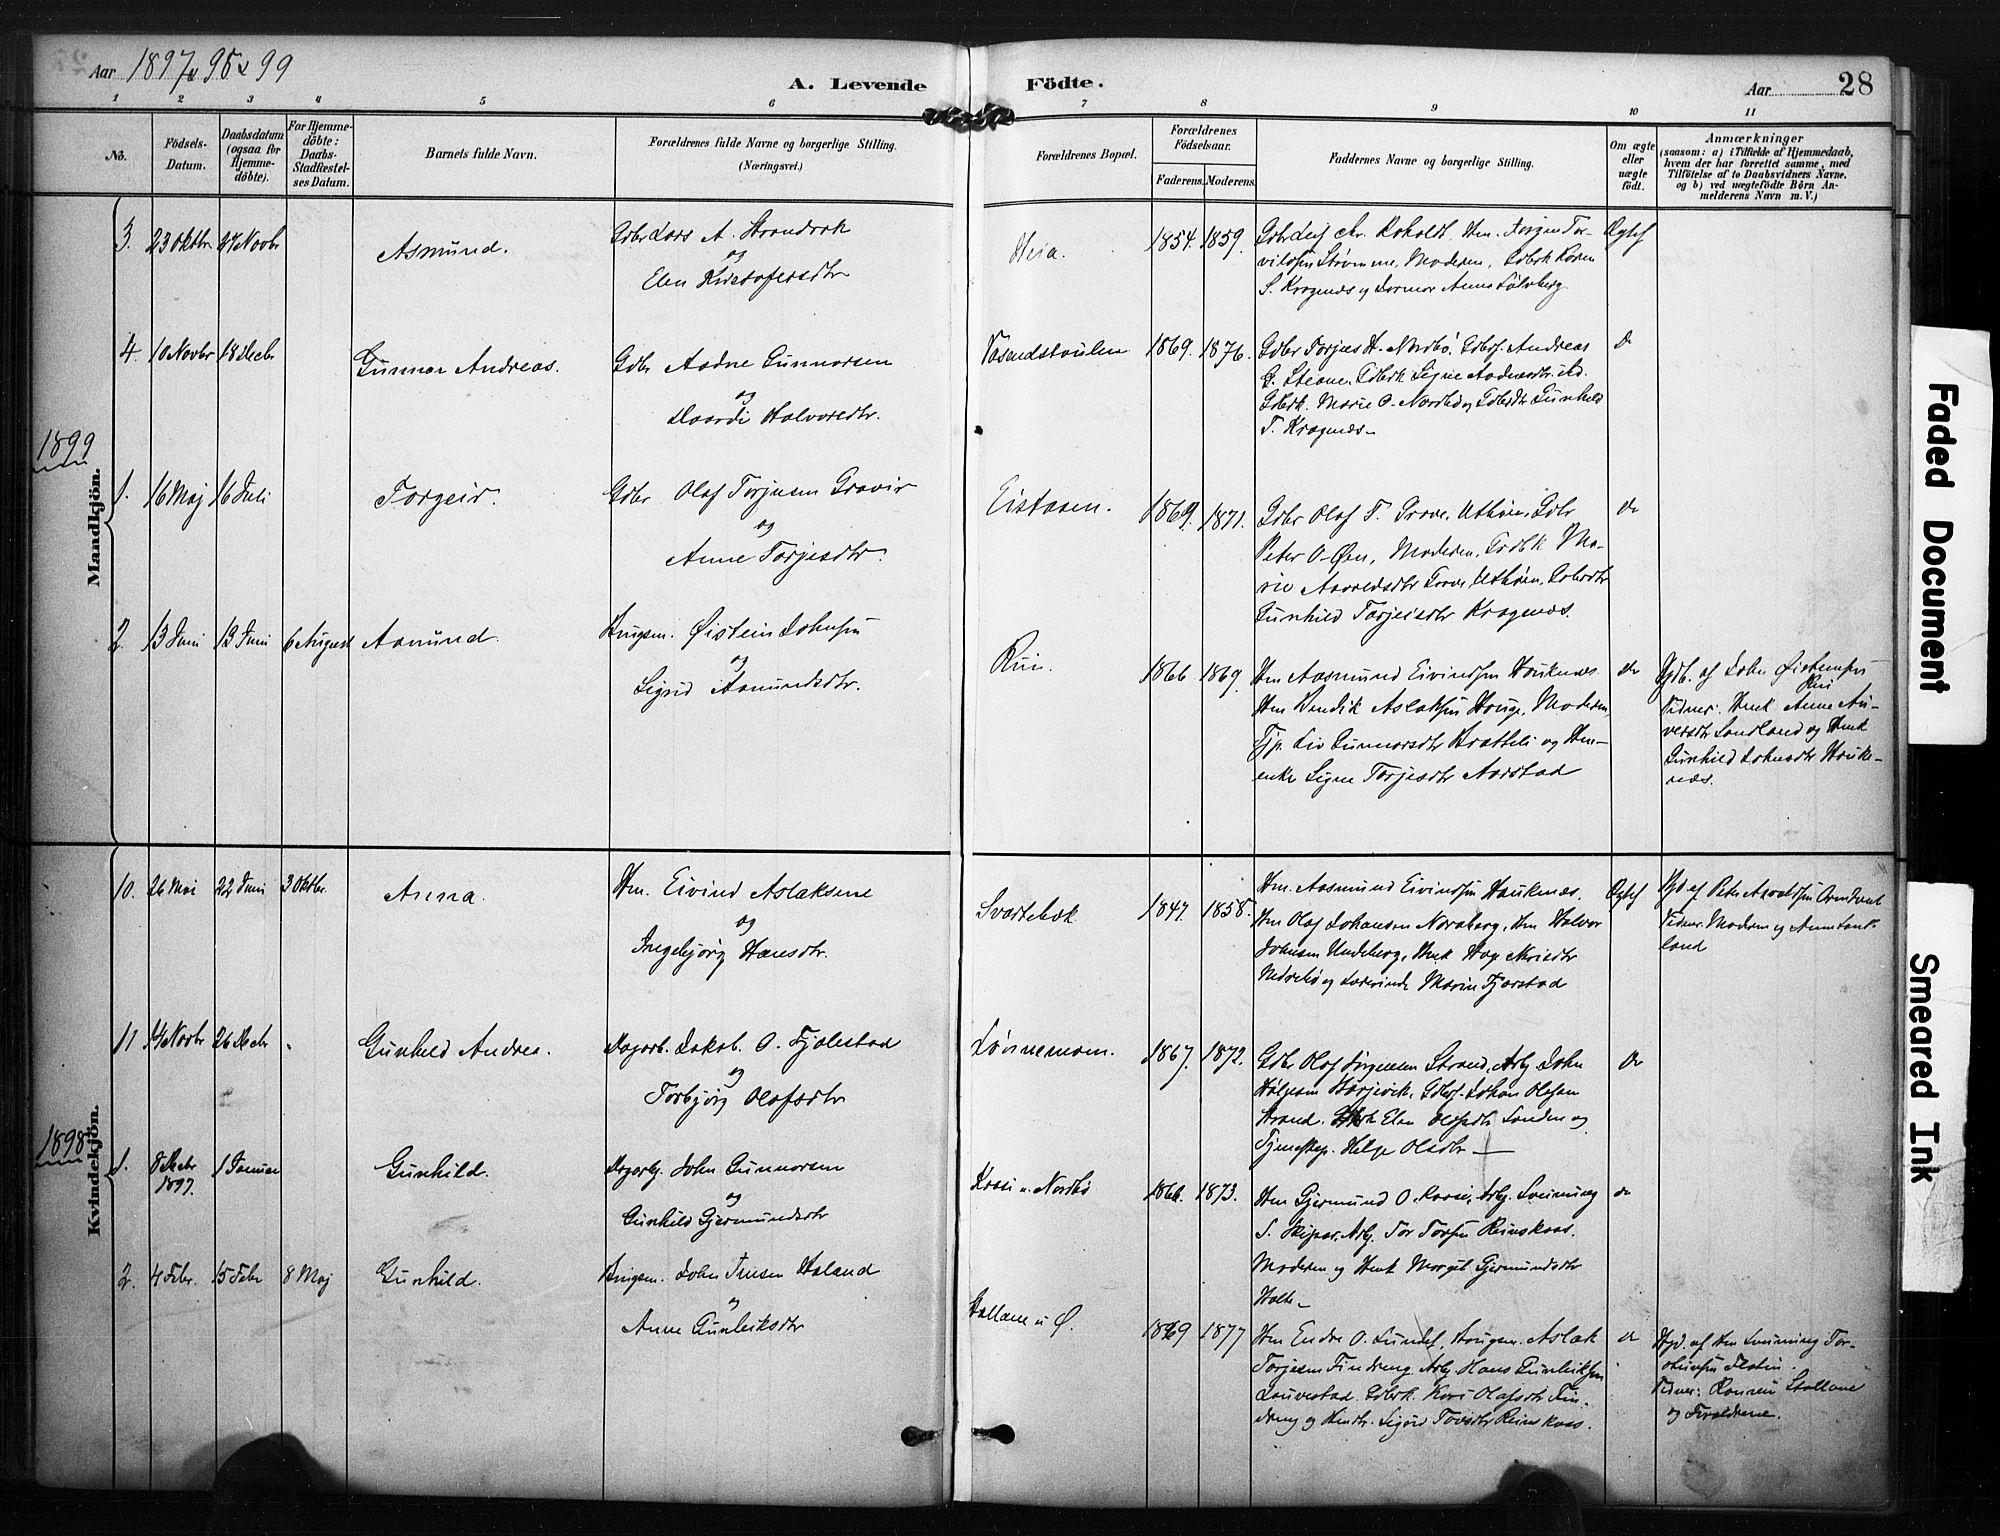 SAKO, Kviteseid kirkebøker, F/Fc/L0002: Ministerialbok nr. III 2, 1882-1908, s. 28